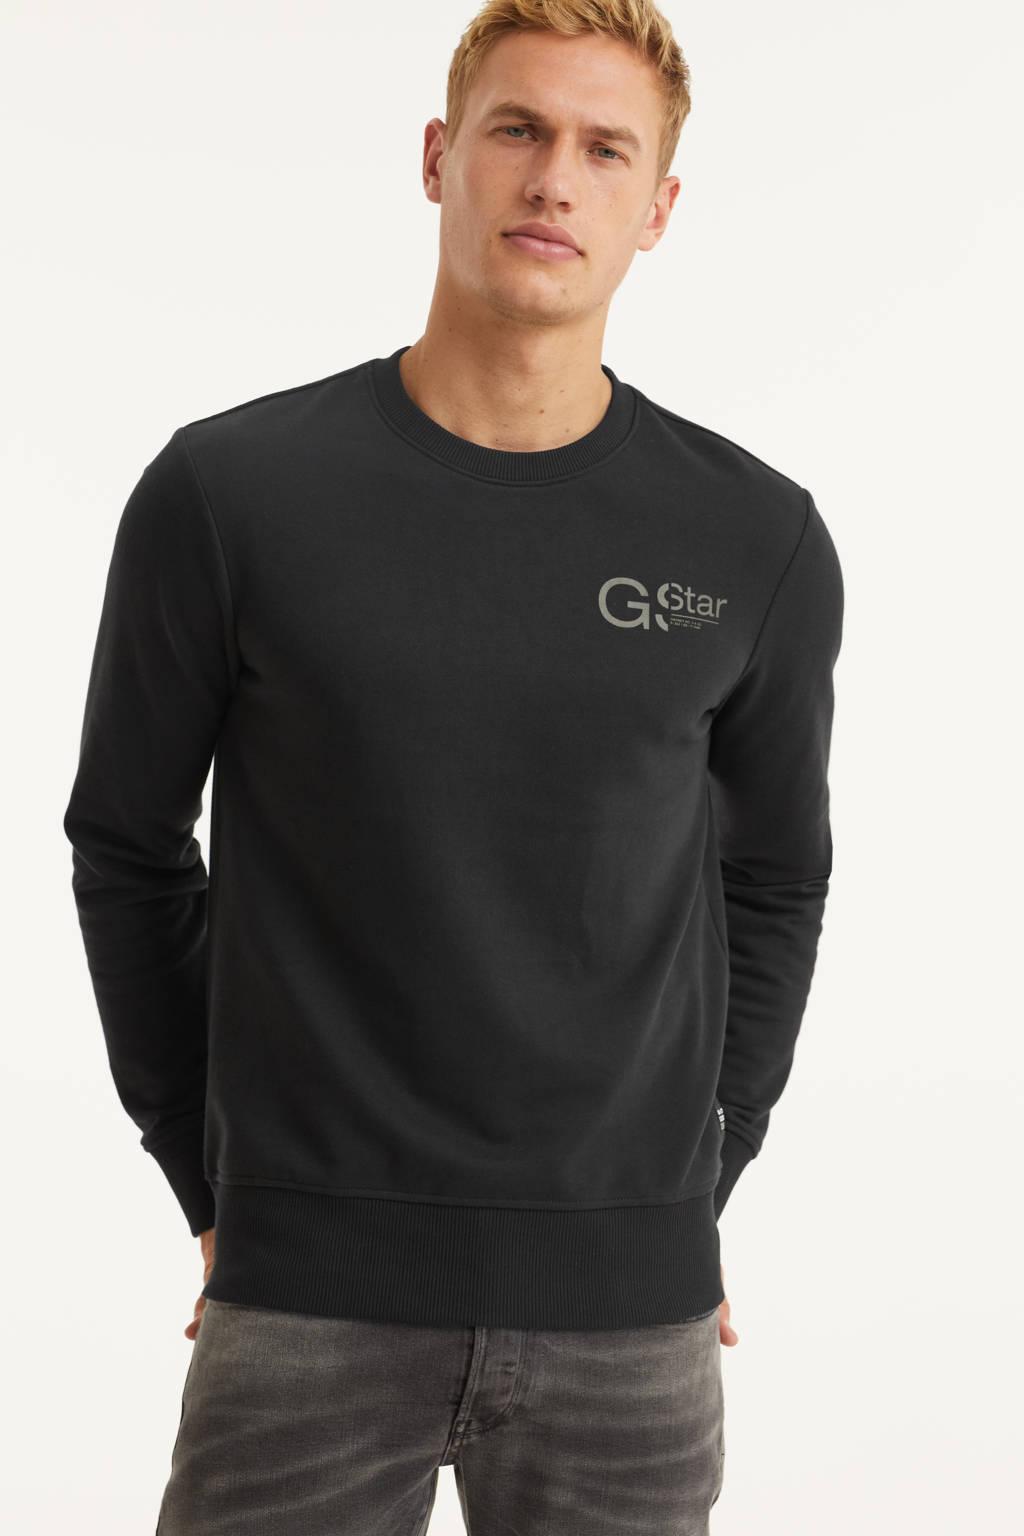 G-Star RAW sweater Graphic met logo zwart, Zwart